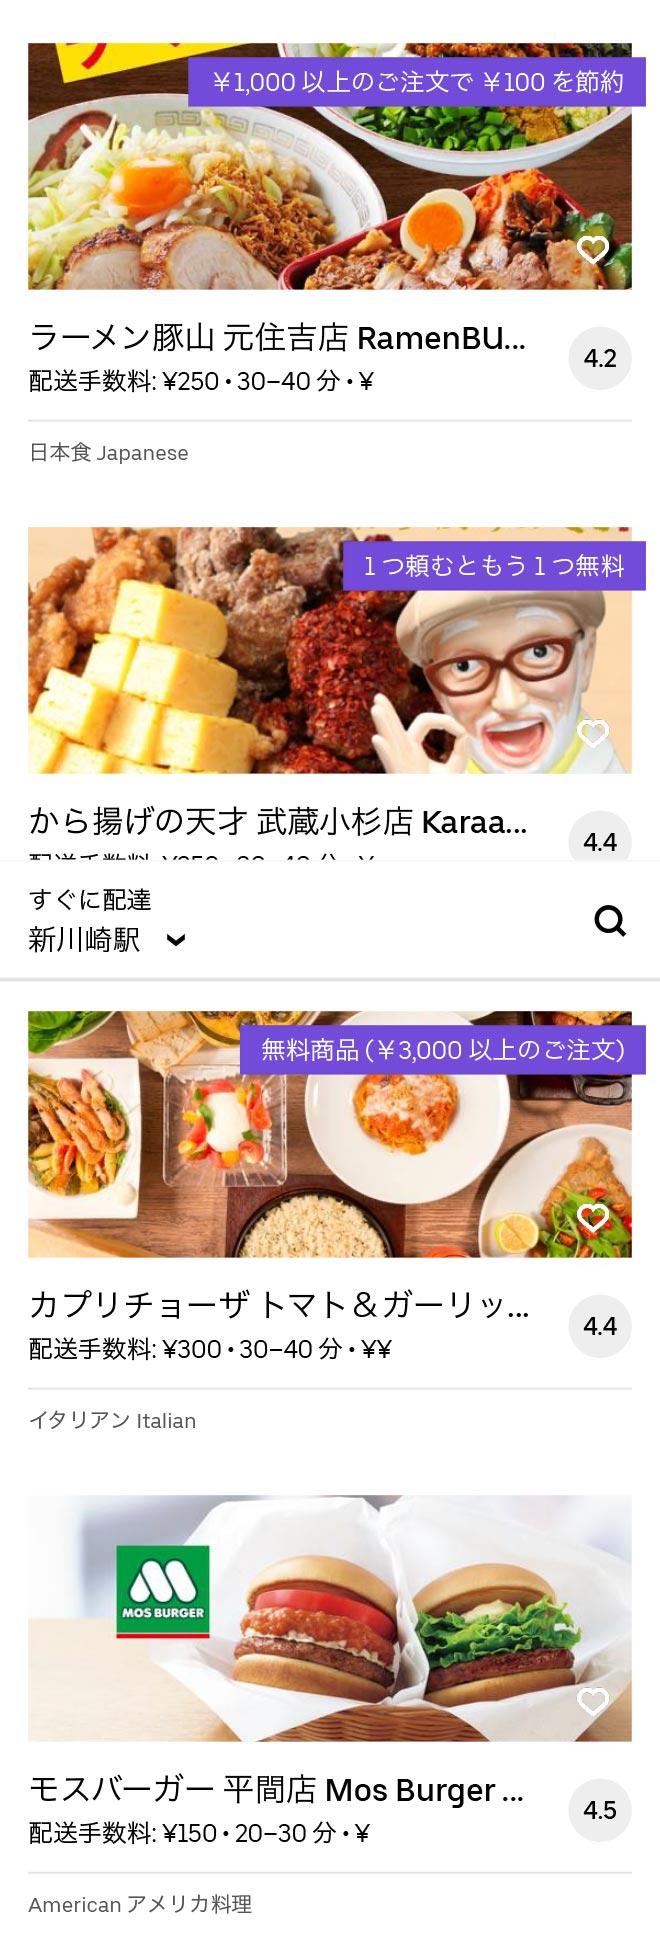 Shin kawasaki menu 2004 03